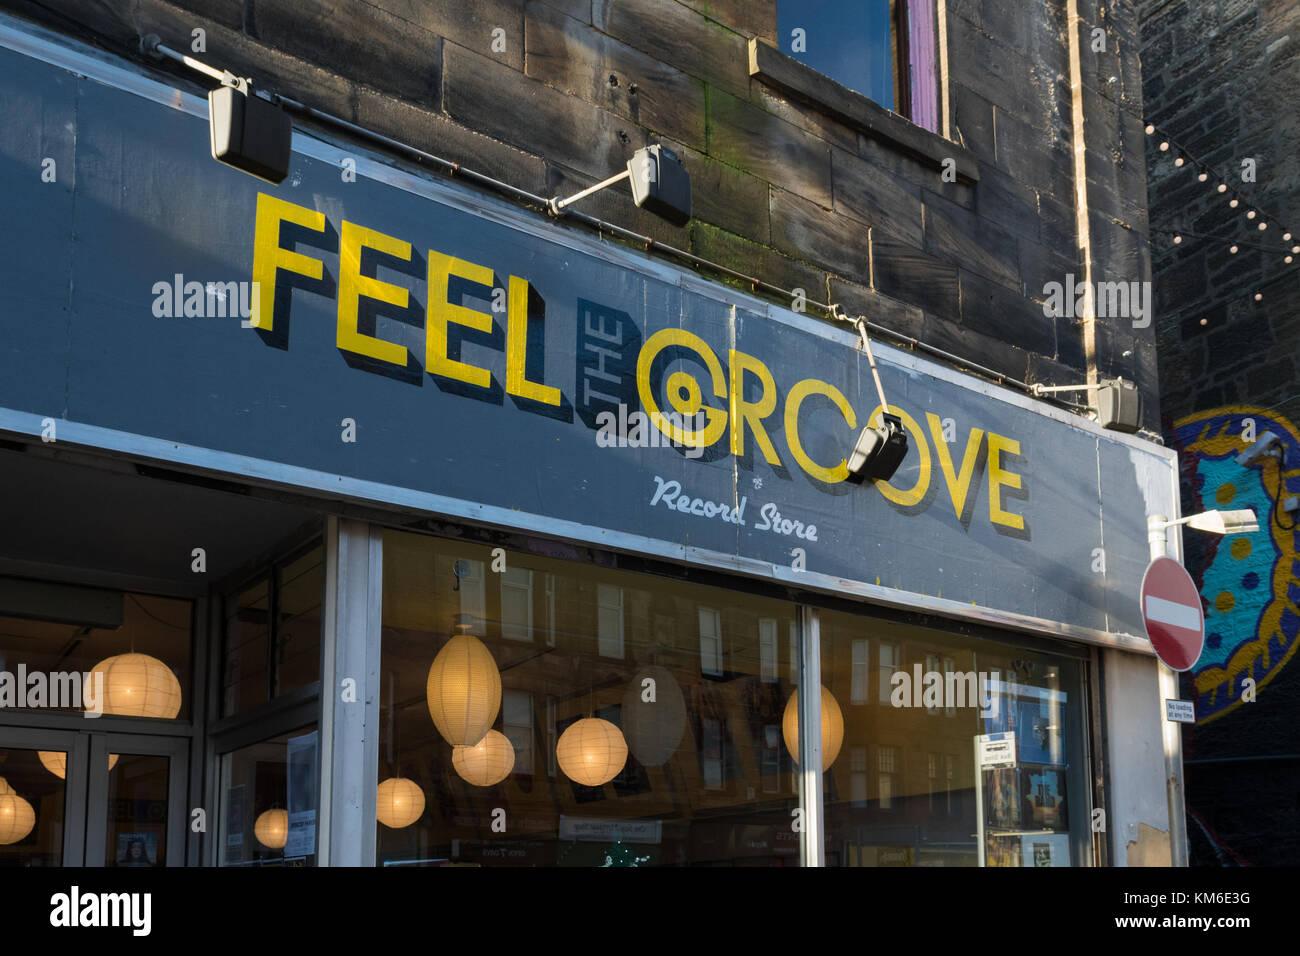 Feel the Groove vinyl record store (previously Apollo Music) Paisley, Scotland, UK - Stock Image